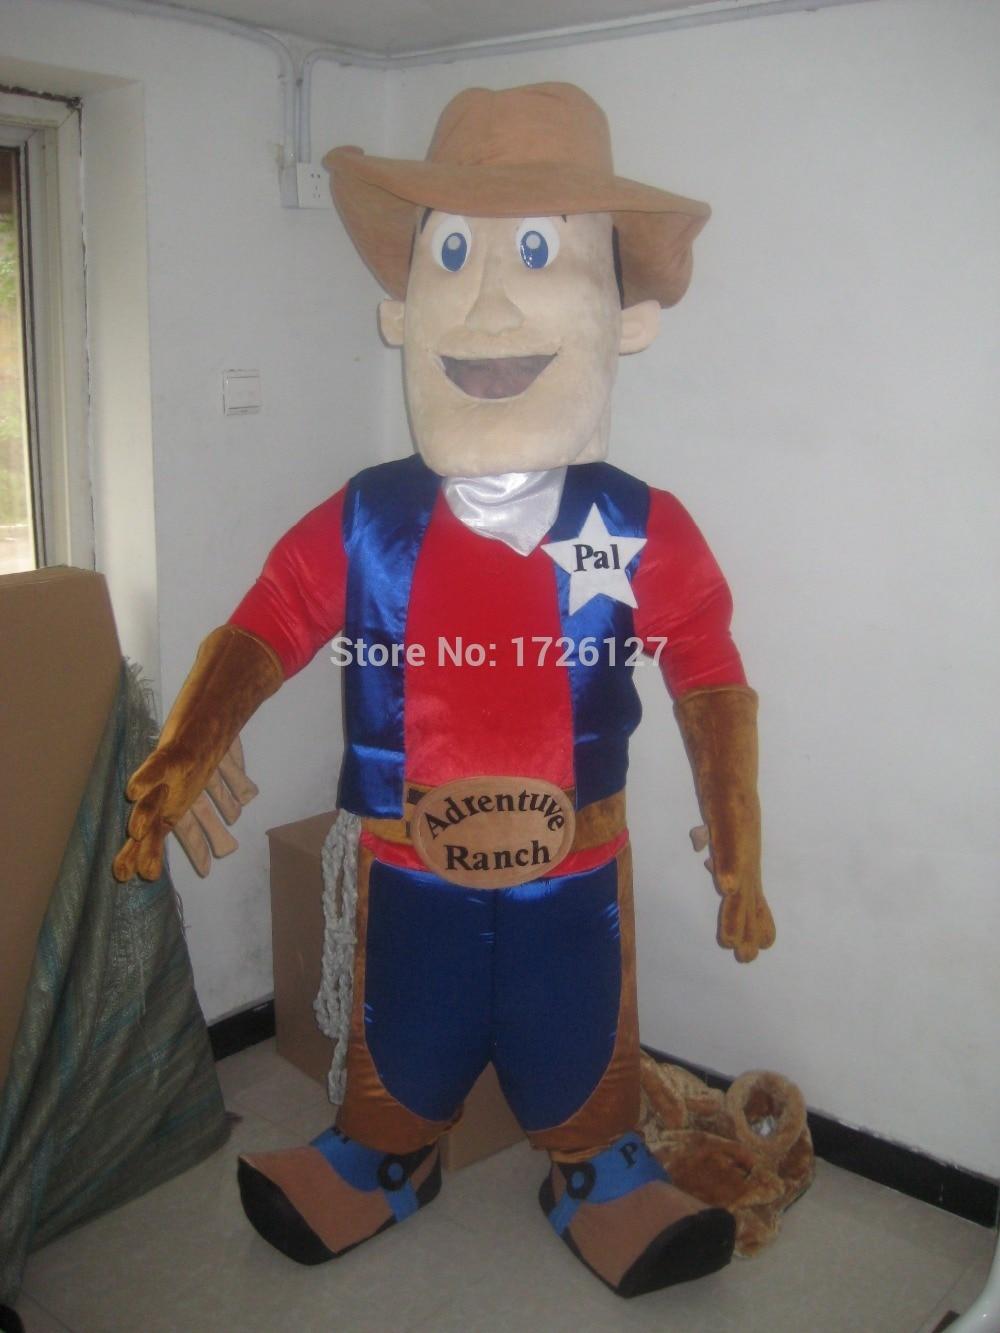 mascot cowboy mascot cow boy costume custom fancy costume anime cosplay kit mascotte theme fancy dress carnival costume